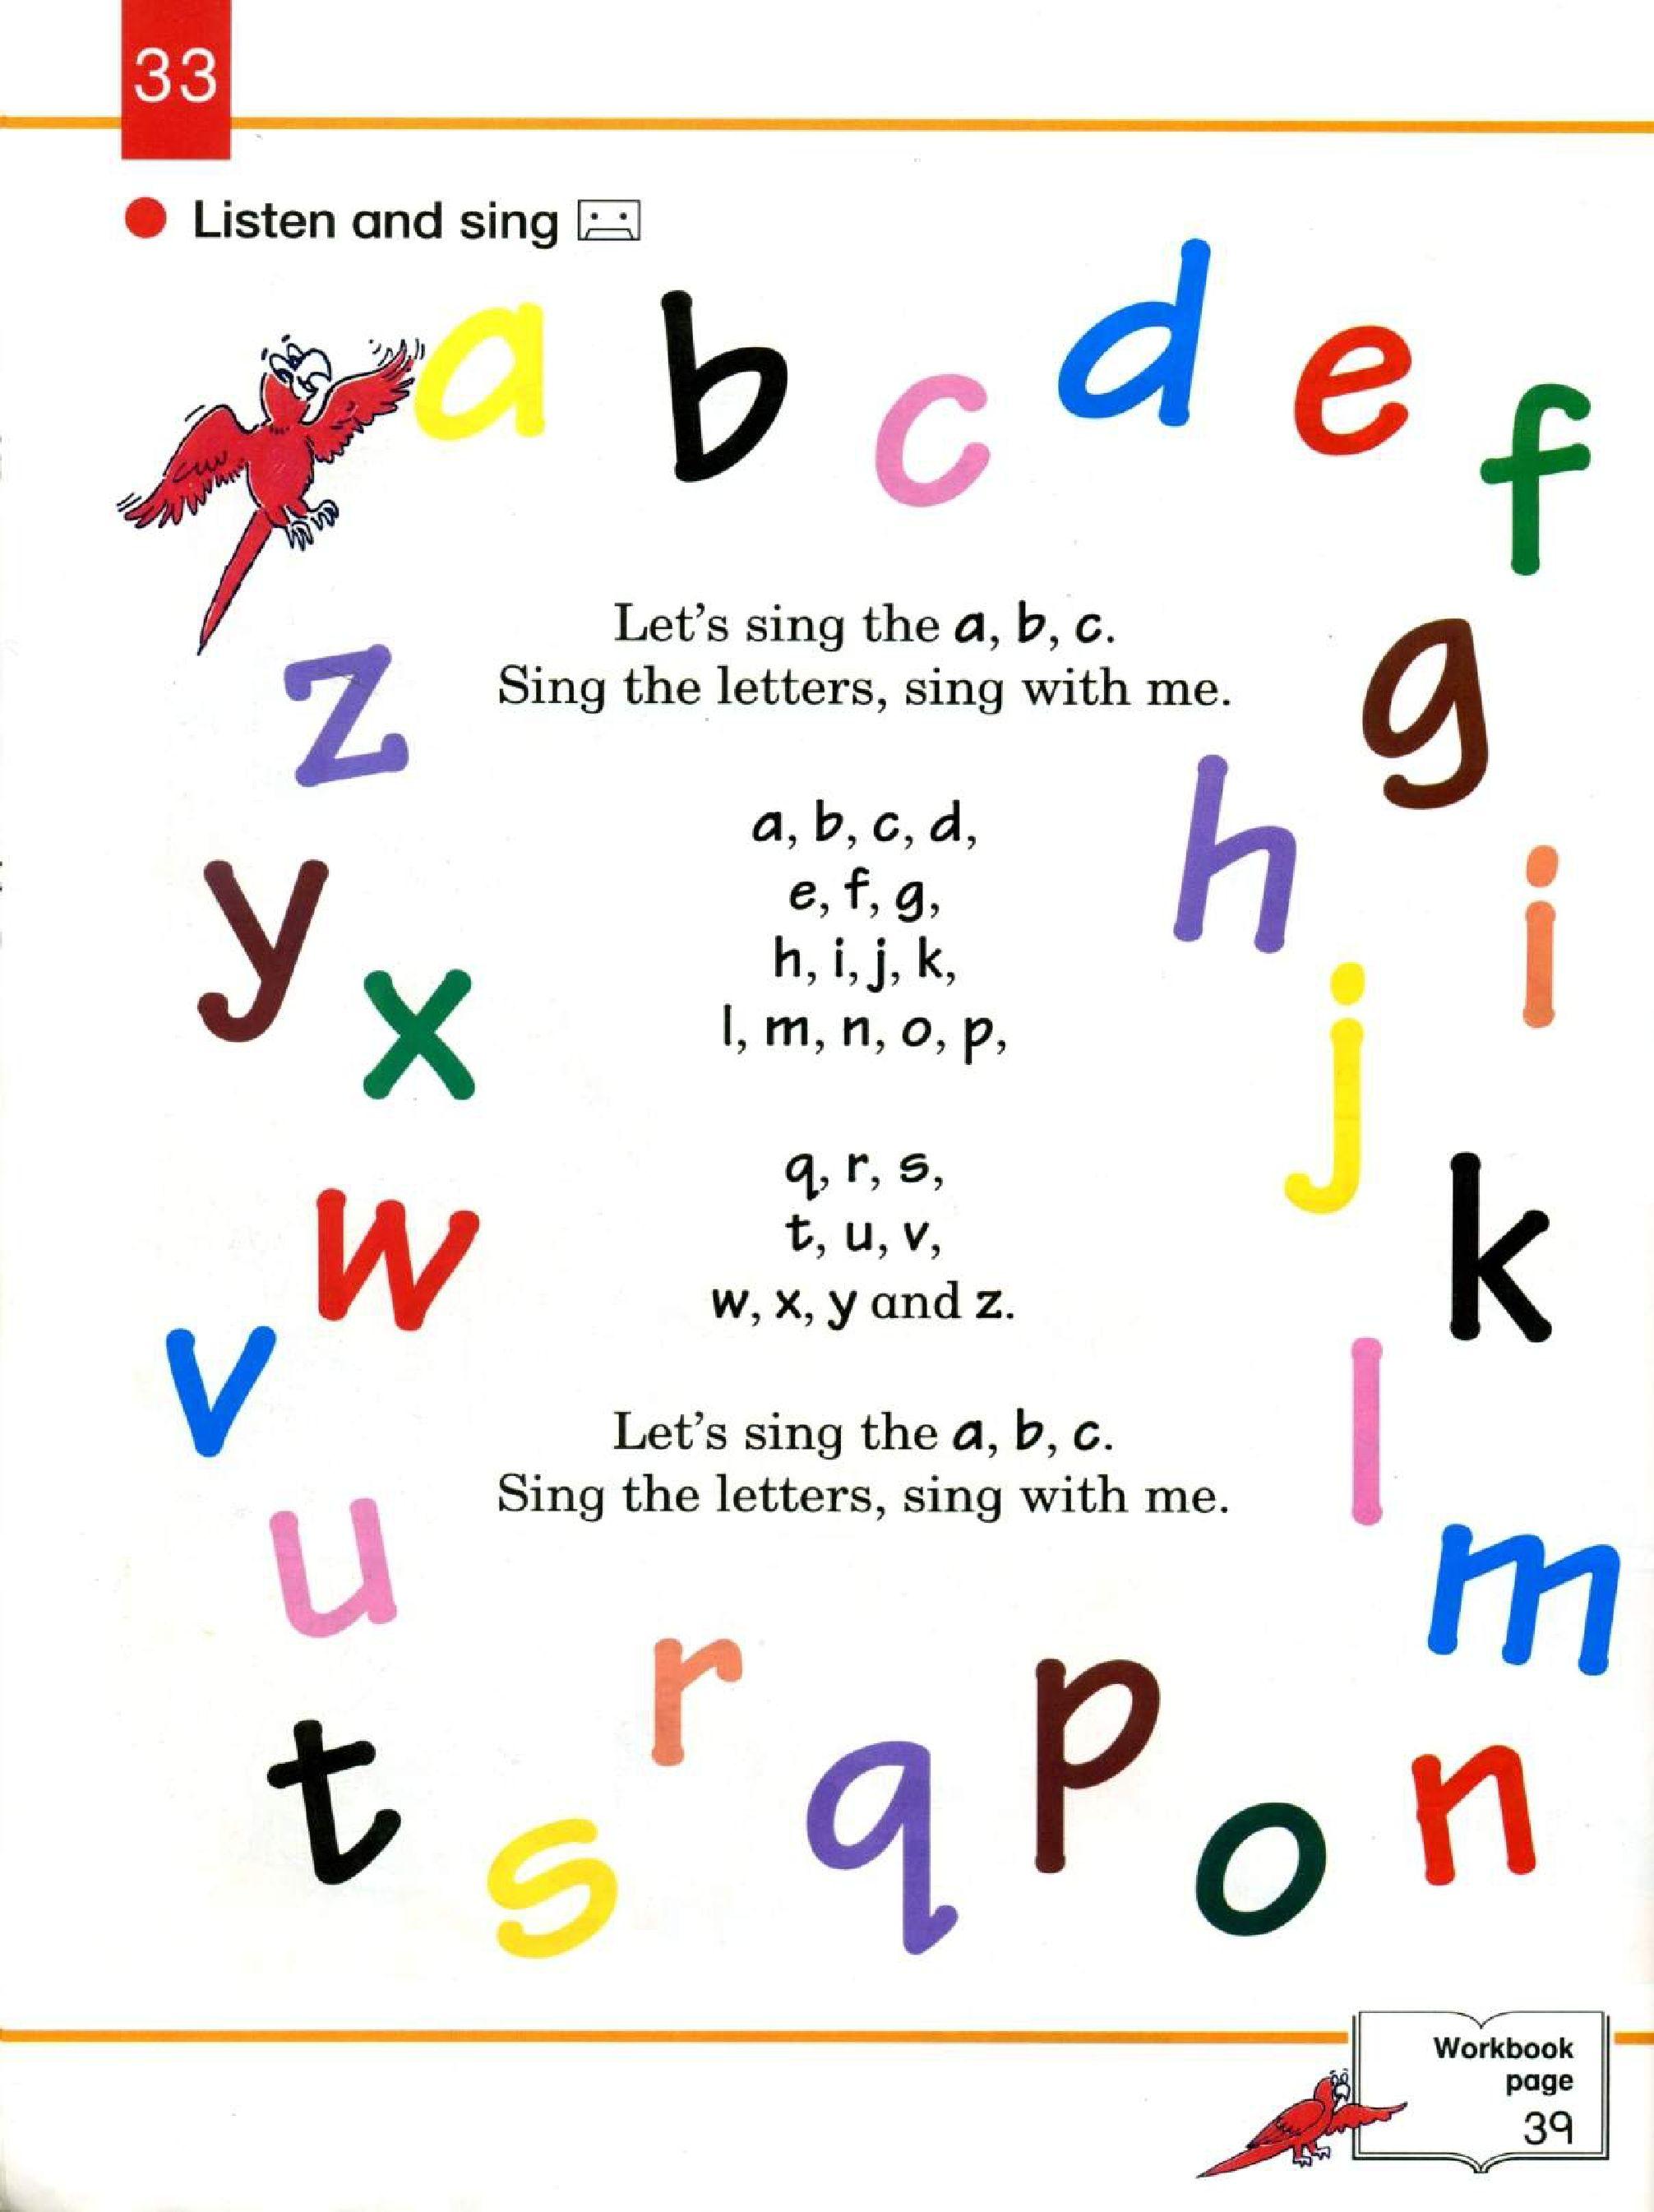 12 Coloring Pages For Kids Printable Children English Lessons For Kids Learning English For Kids Alphabet Worksheets Kindergarten [ 2690 x 2012 Pixel ]